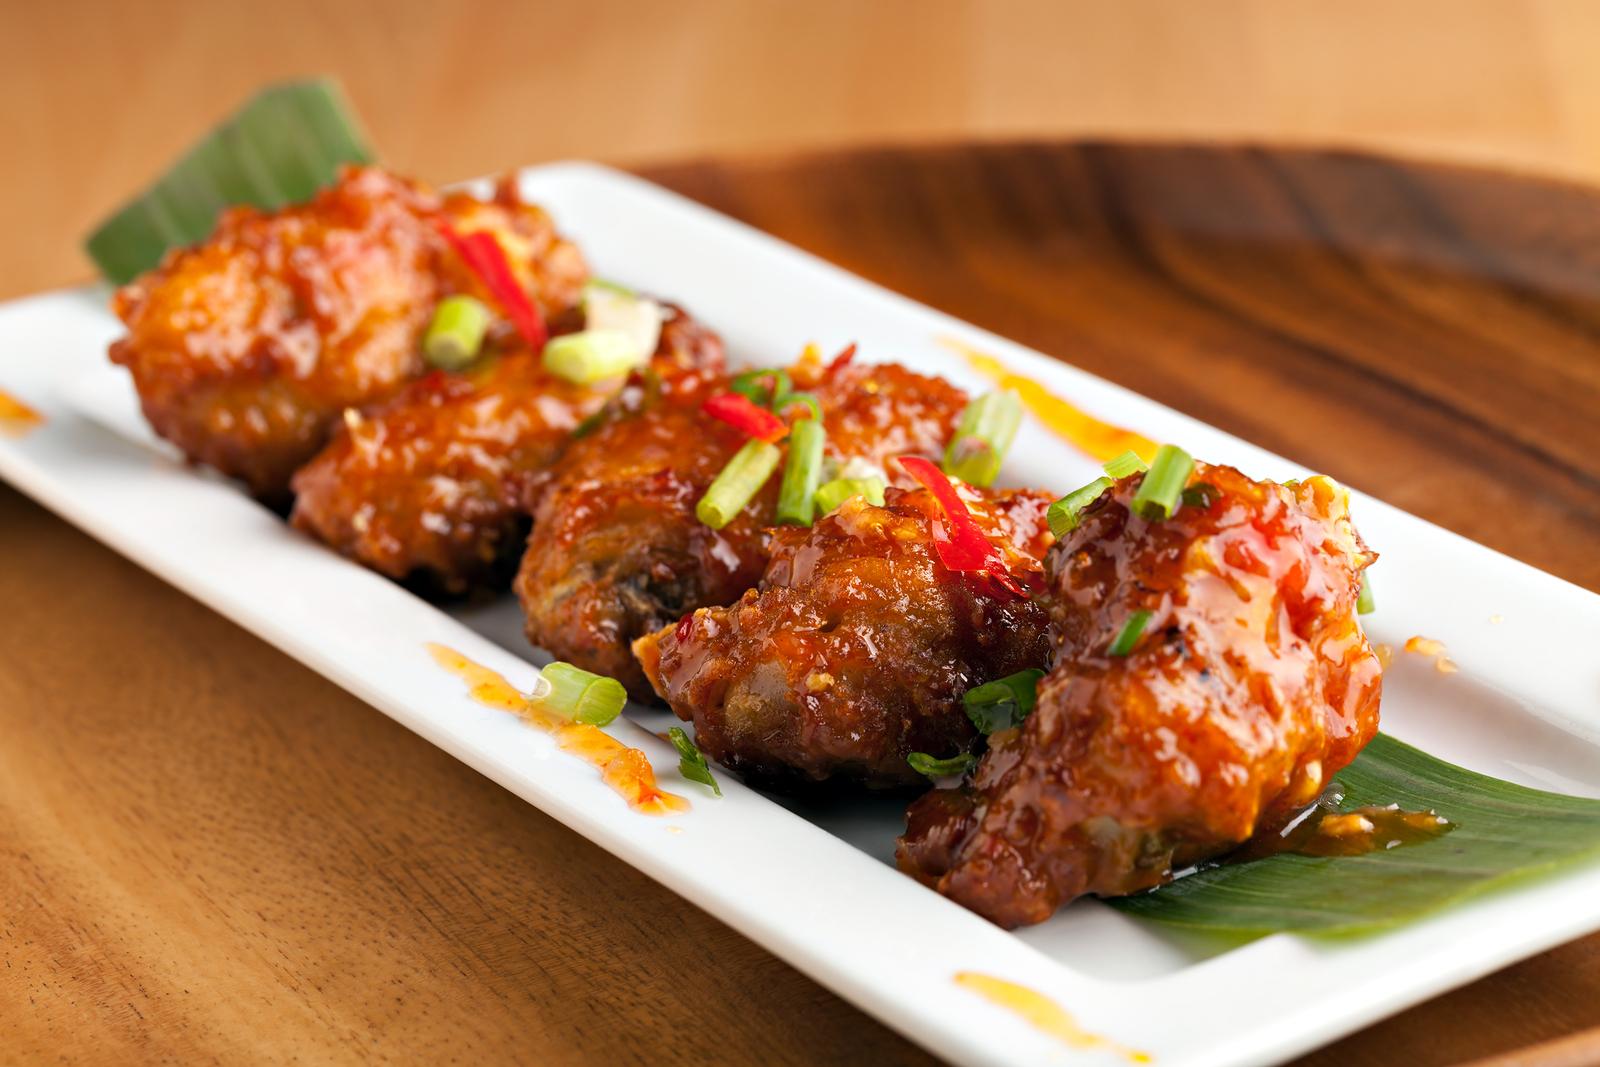 canecutters restaurant now serves tapas